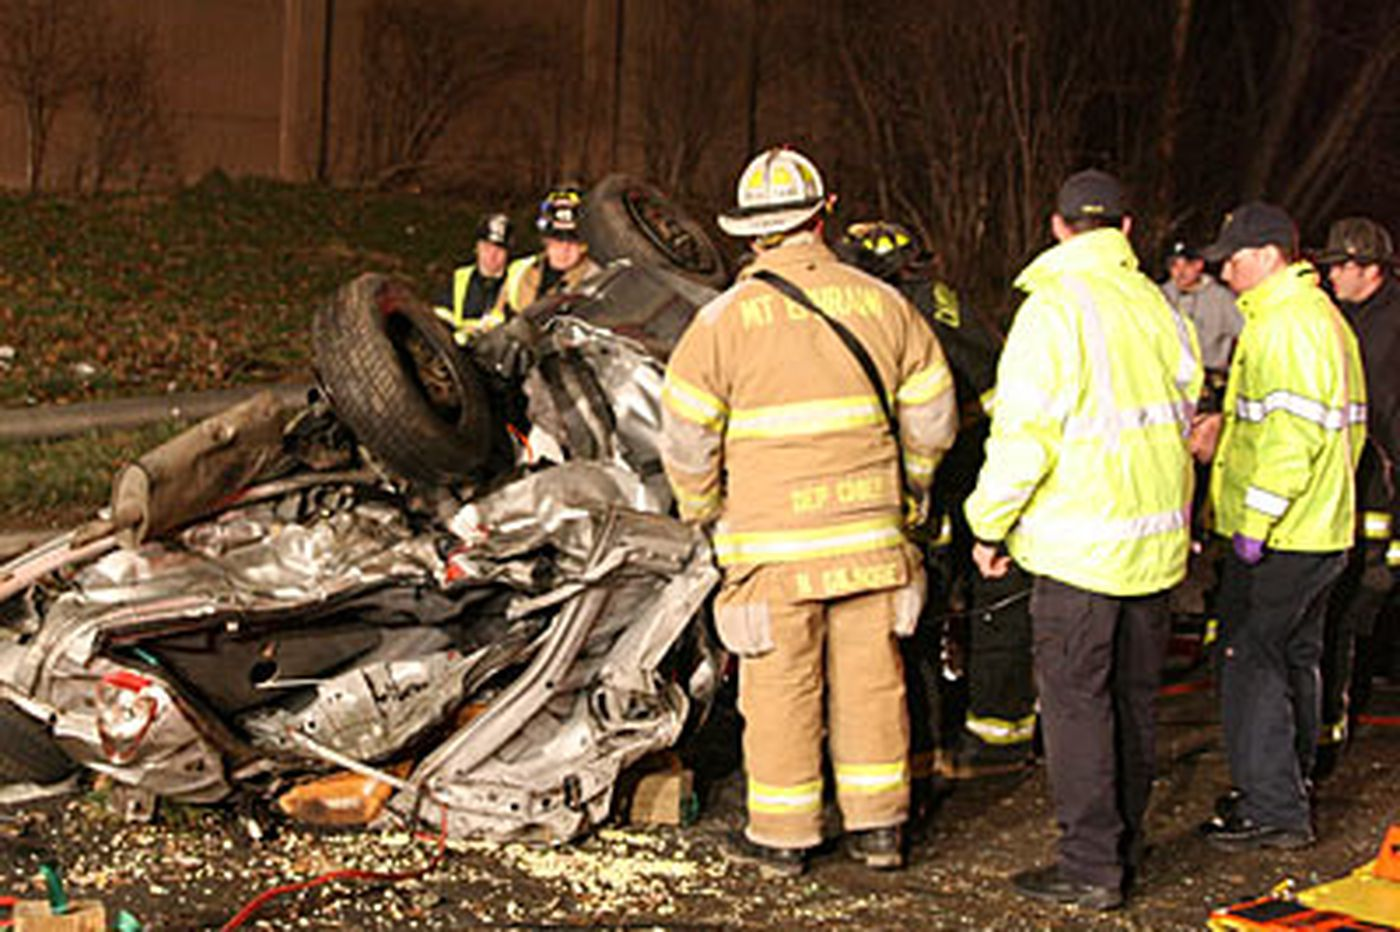 PCP, cocaine, .357, found after fiery S.J. crash